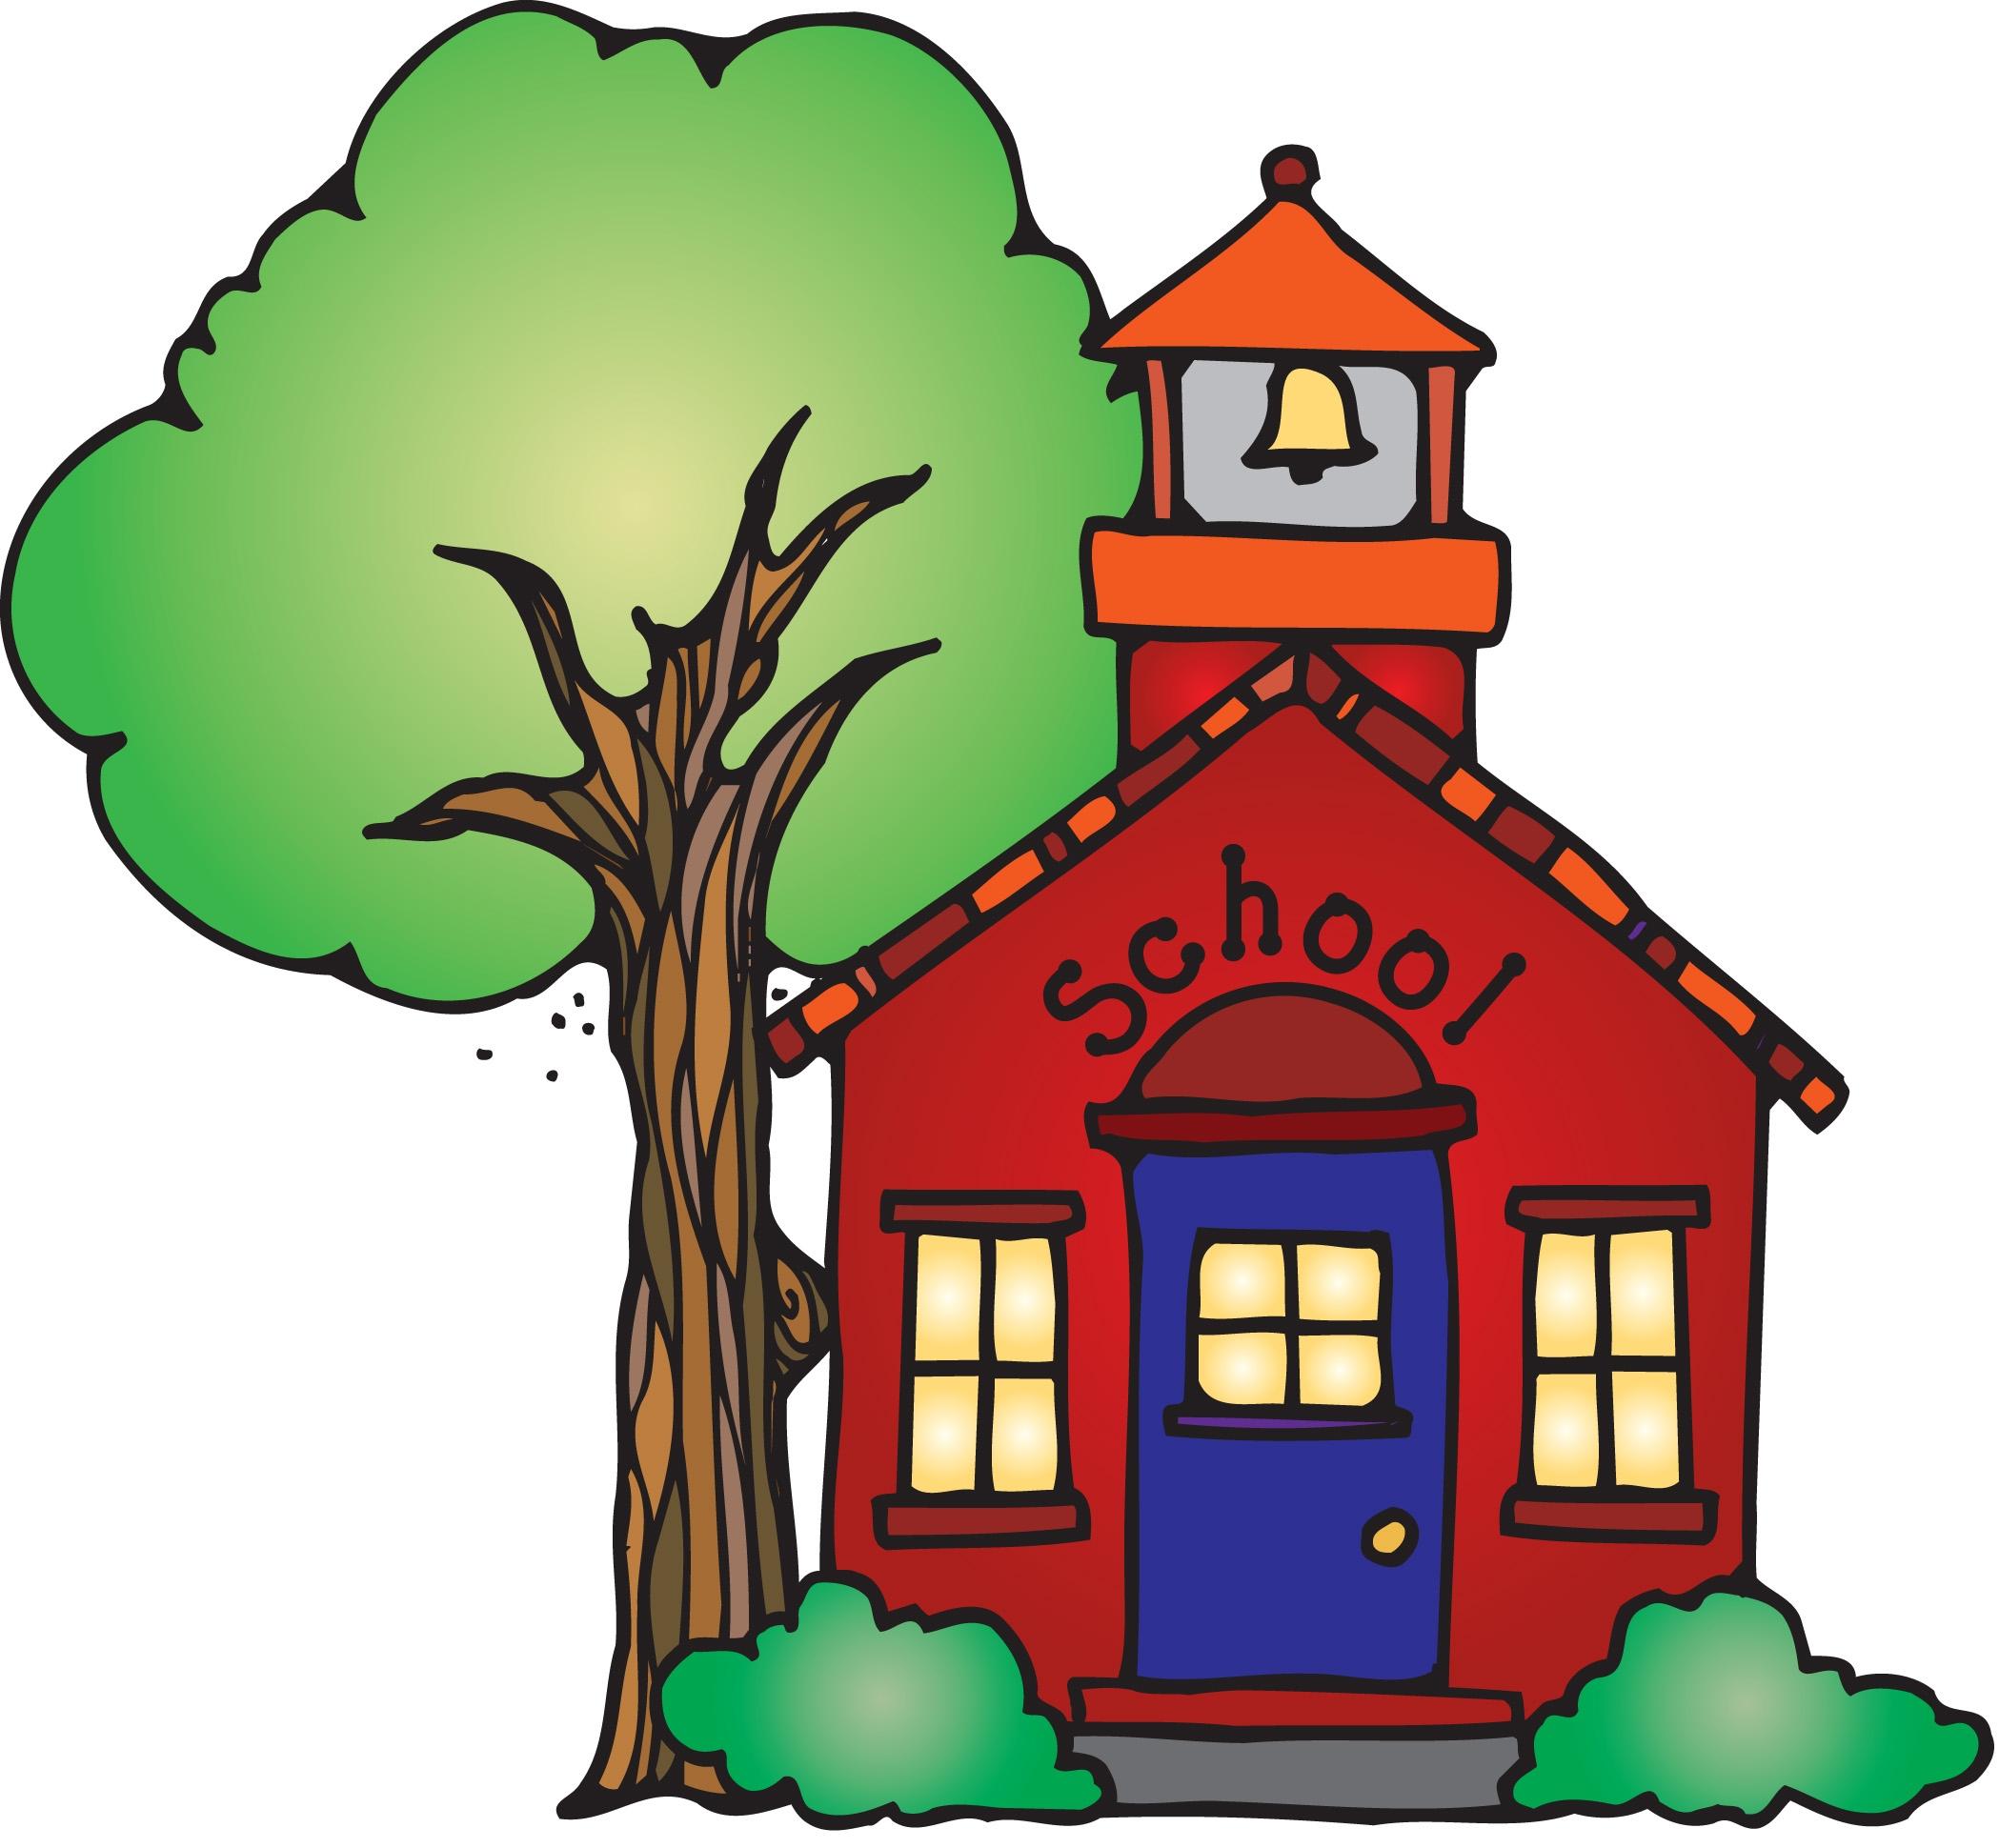 Schoolhouse clipart 2